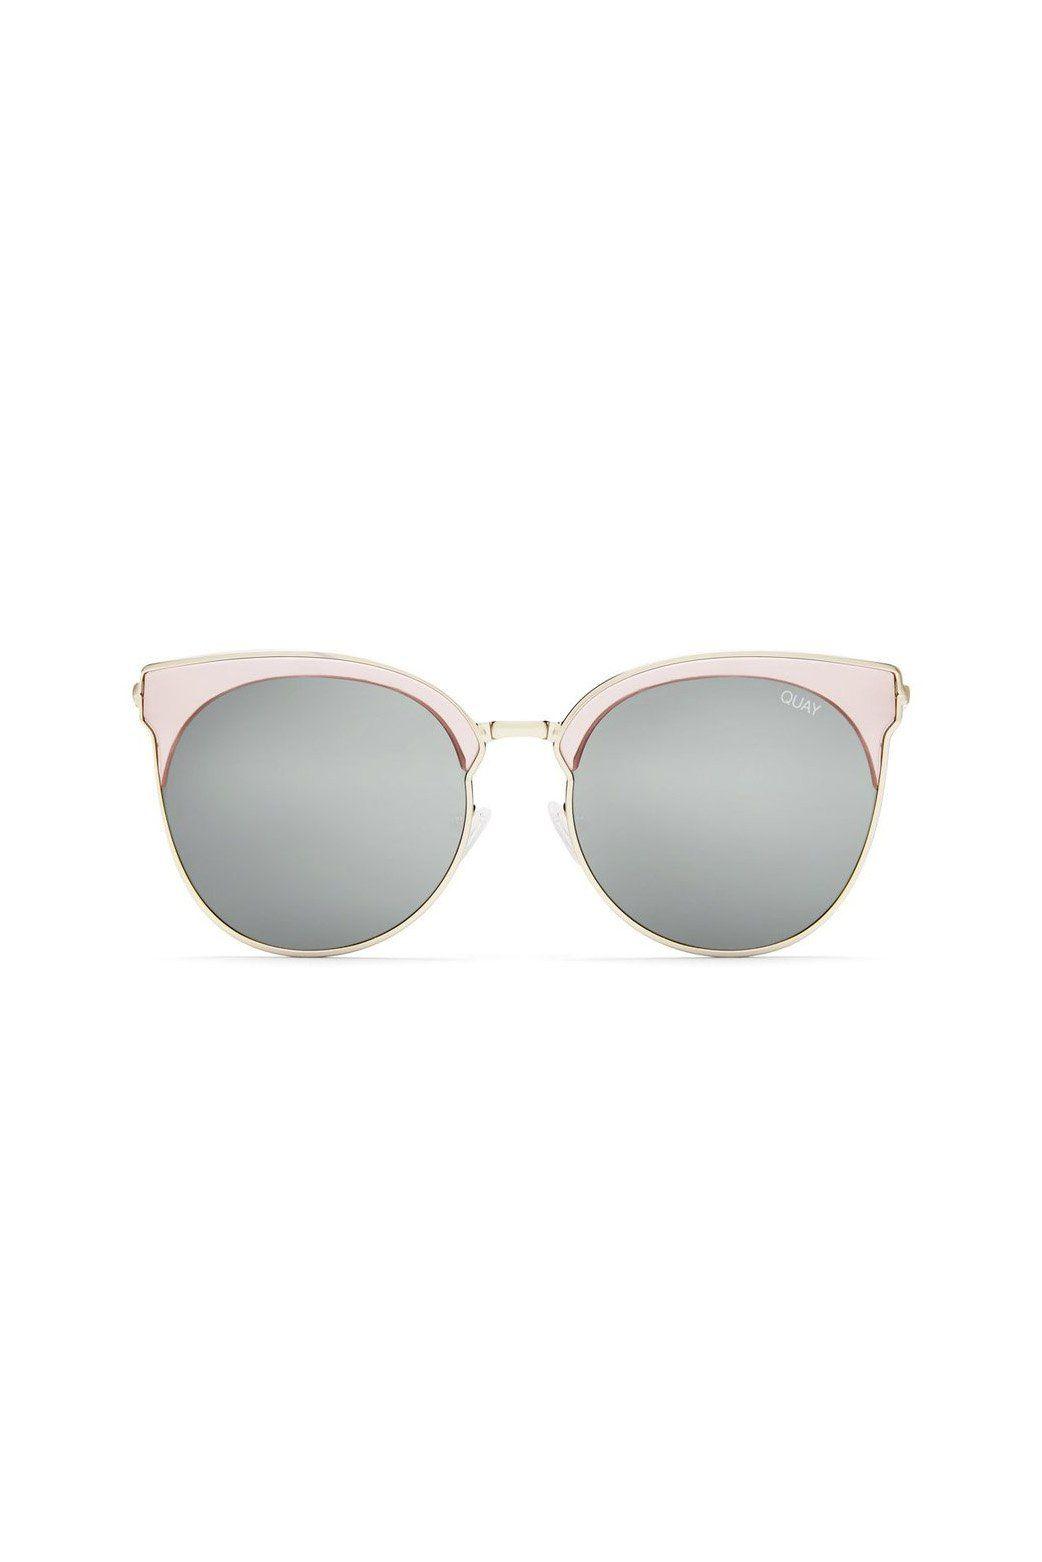 c32dcba457 Quay Australia Mia Bella Sunglasses